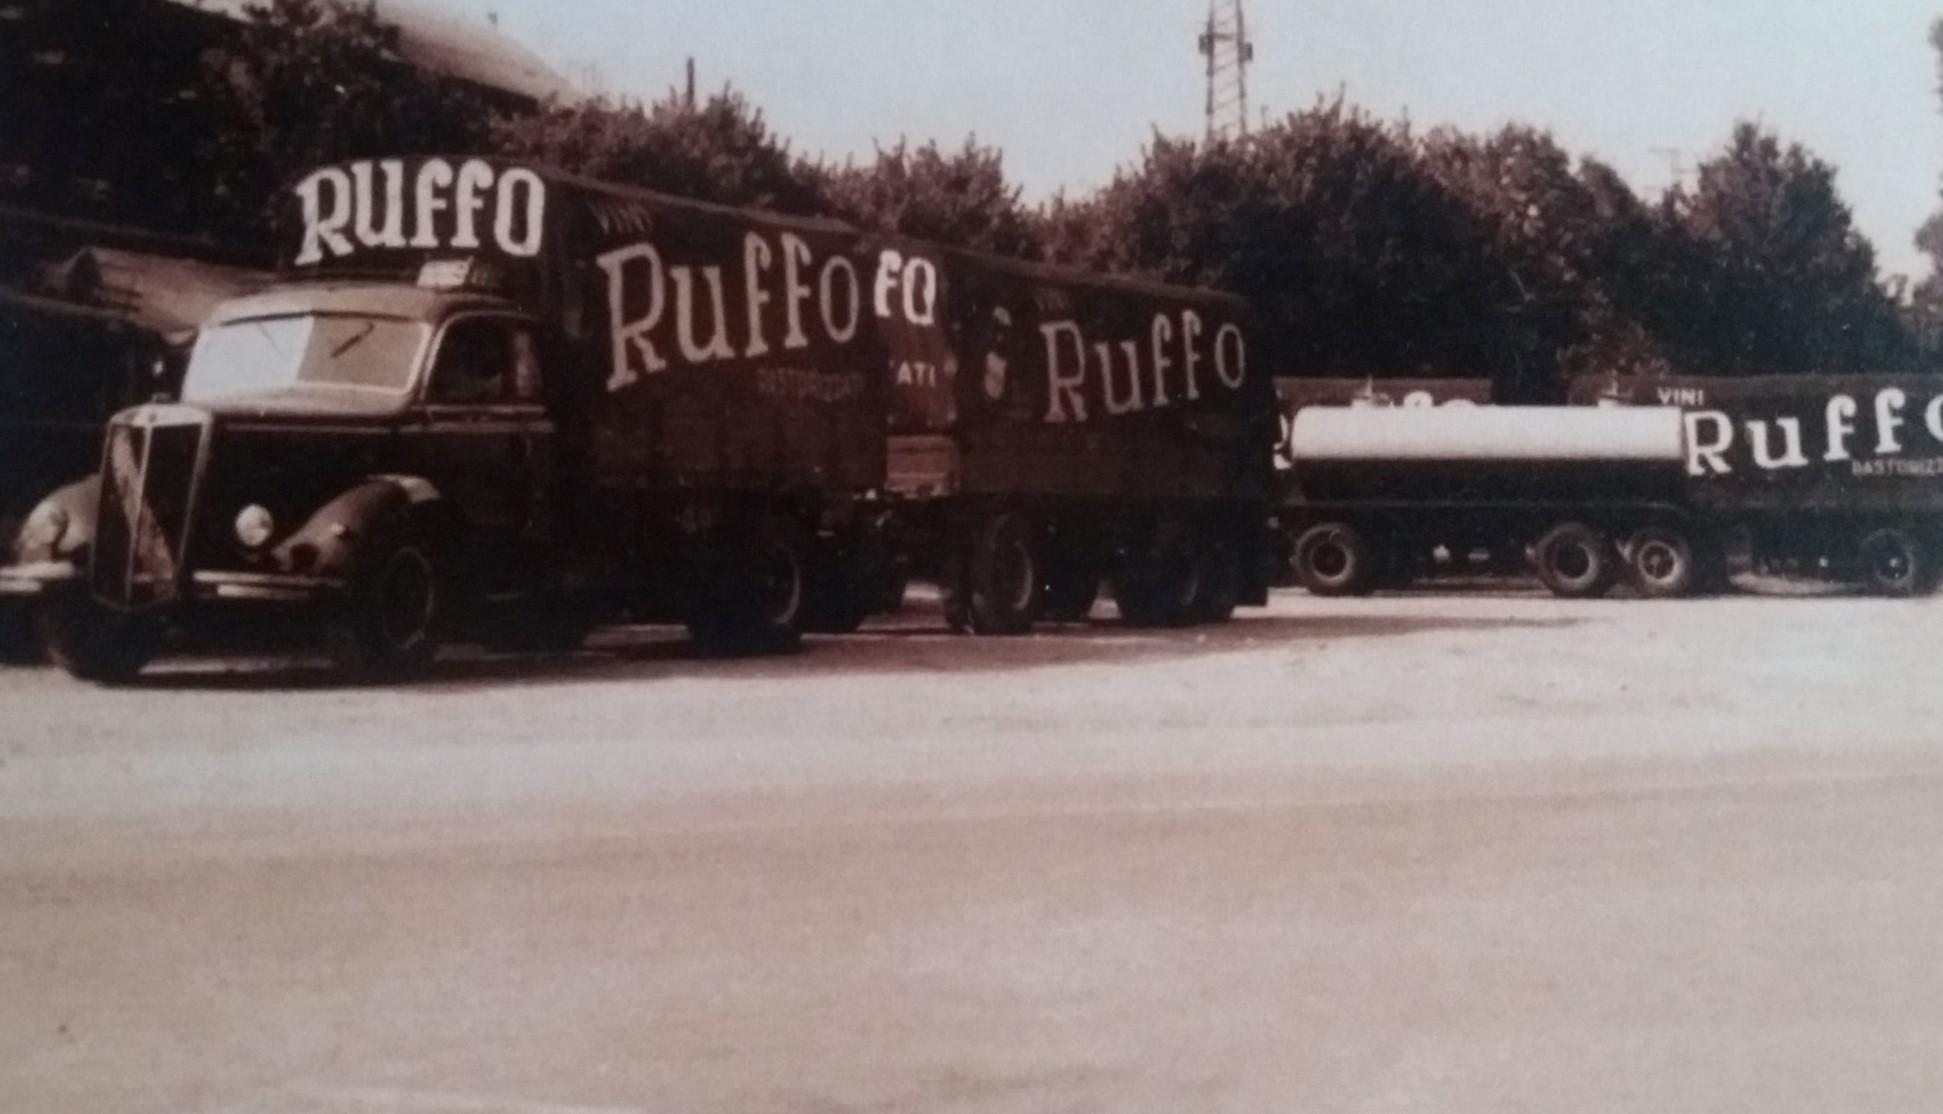 Lancia--Ruffo-Verona-